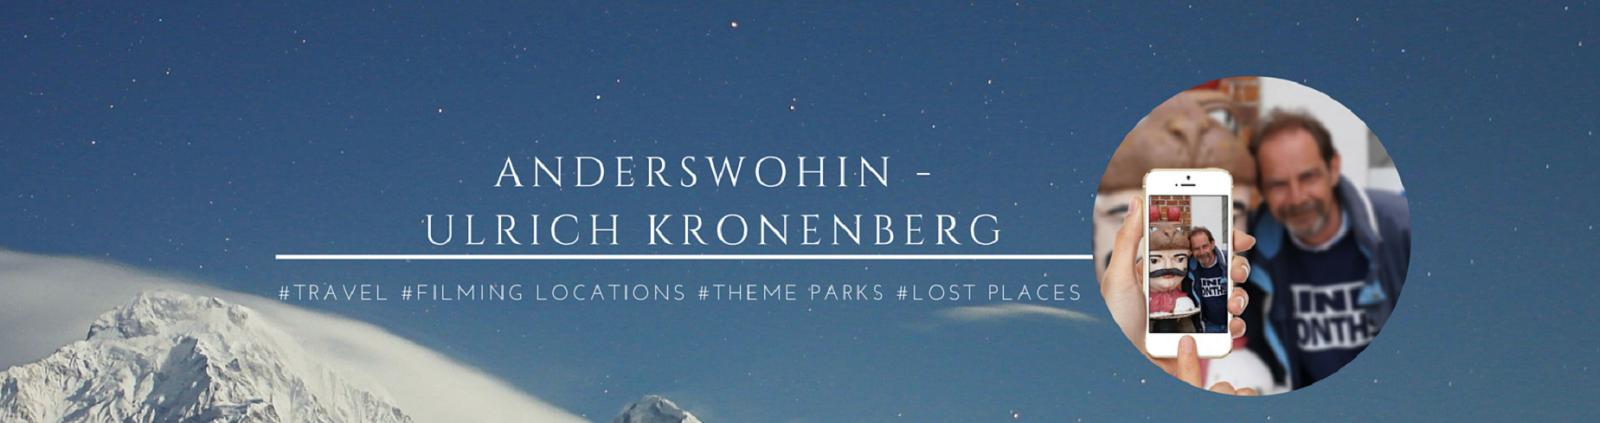 anderswohin.de/ Ulrich Kronenberg